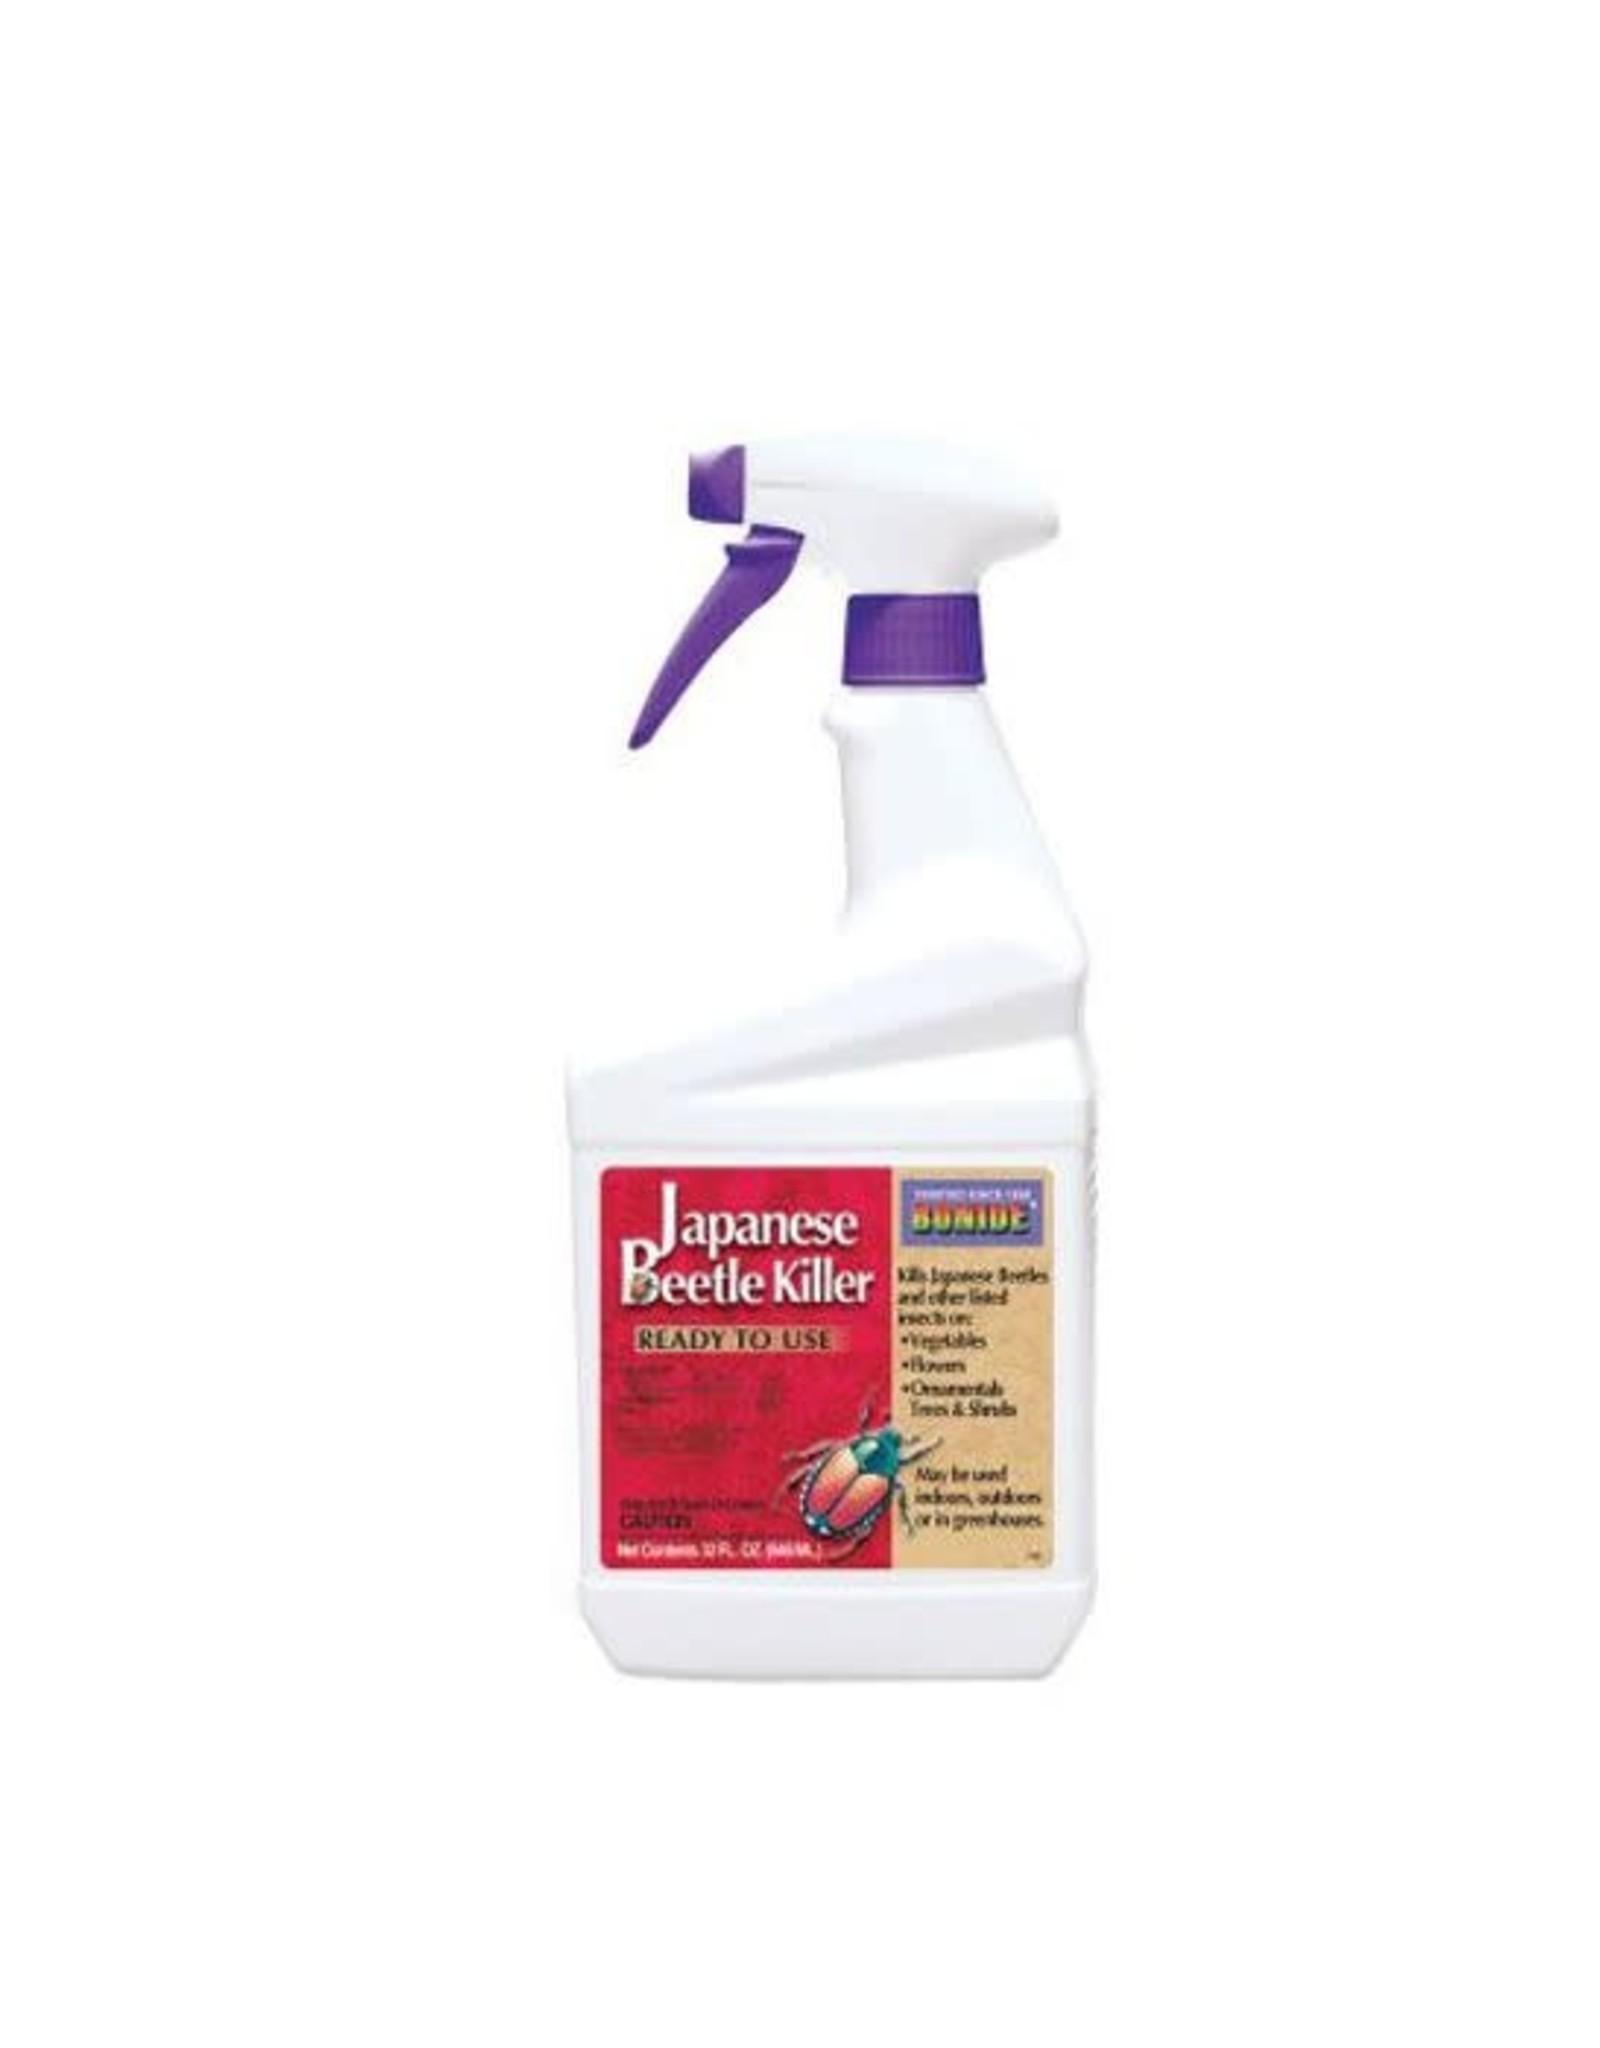 Bonide Japanese Beetle Killer 32 oz Spray